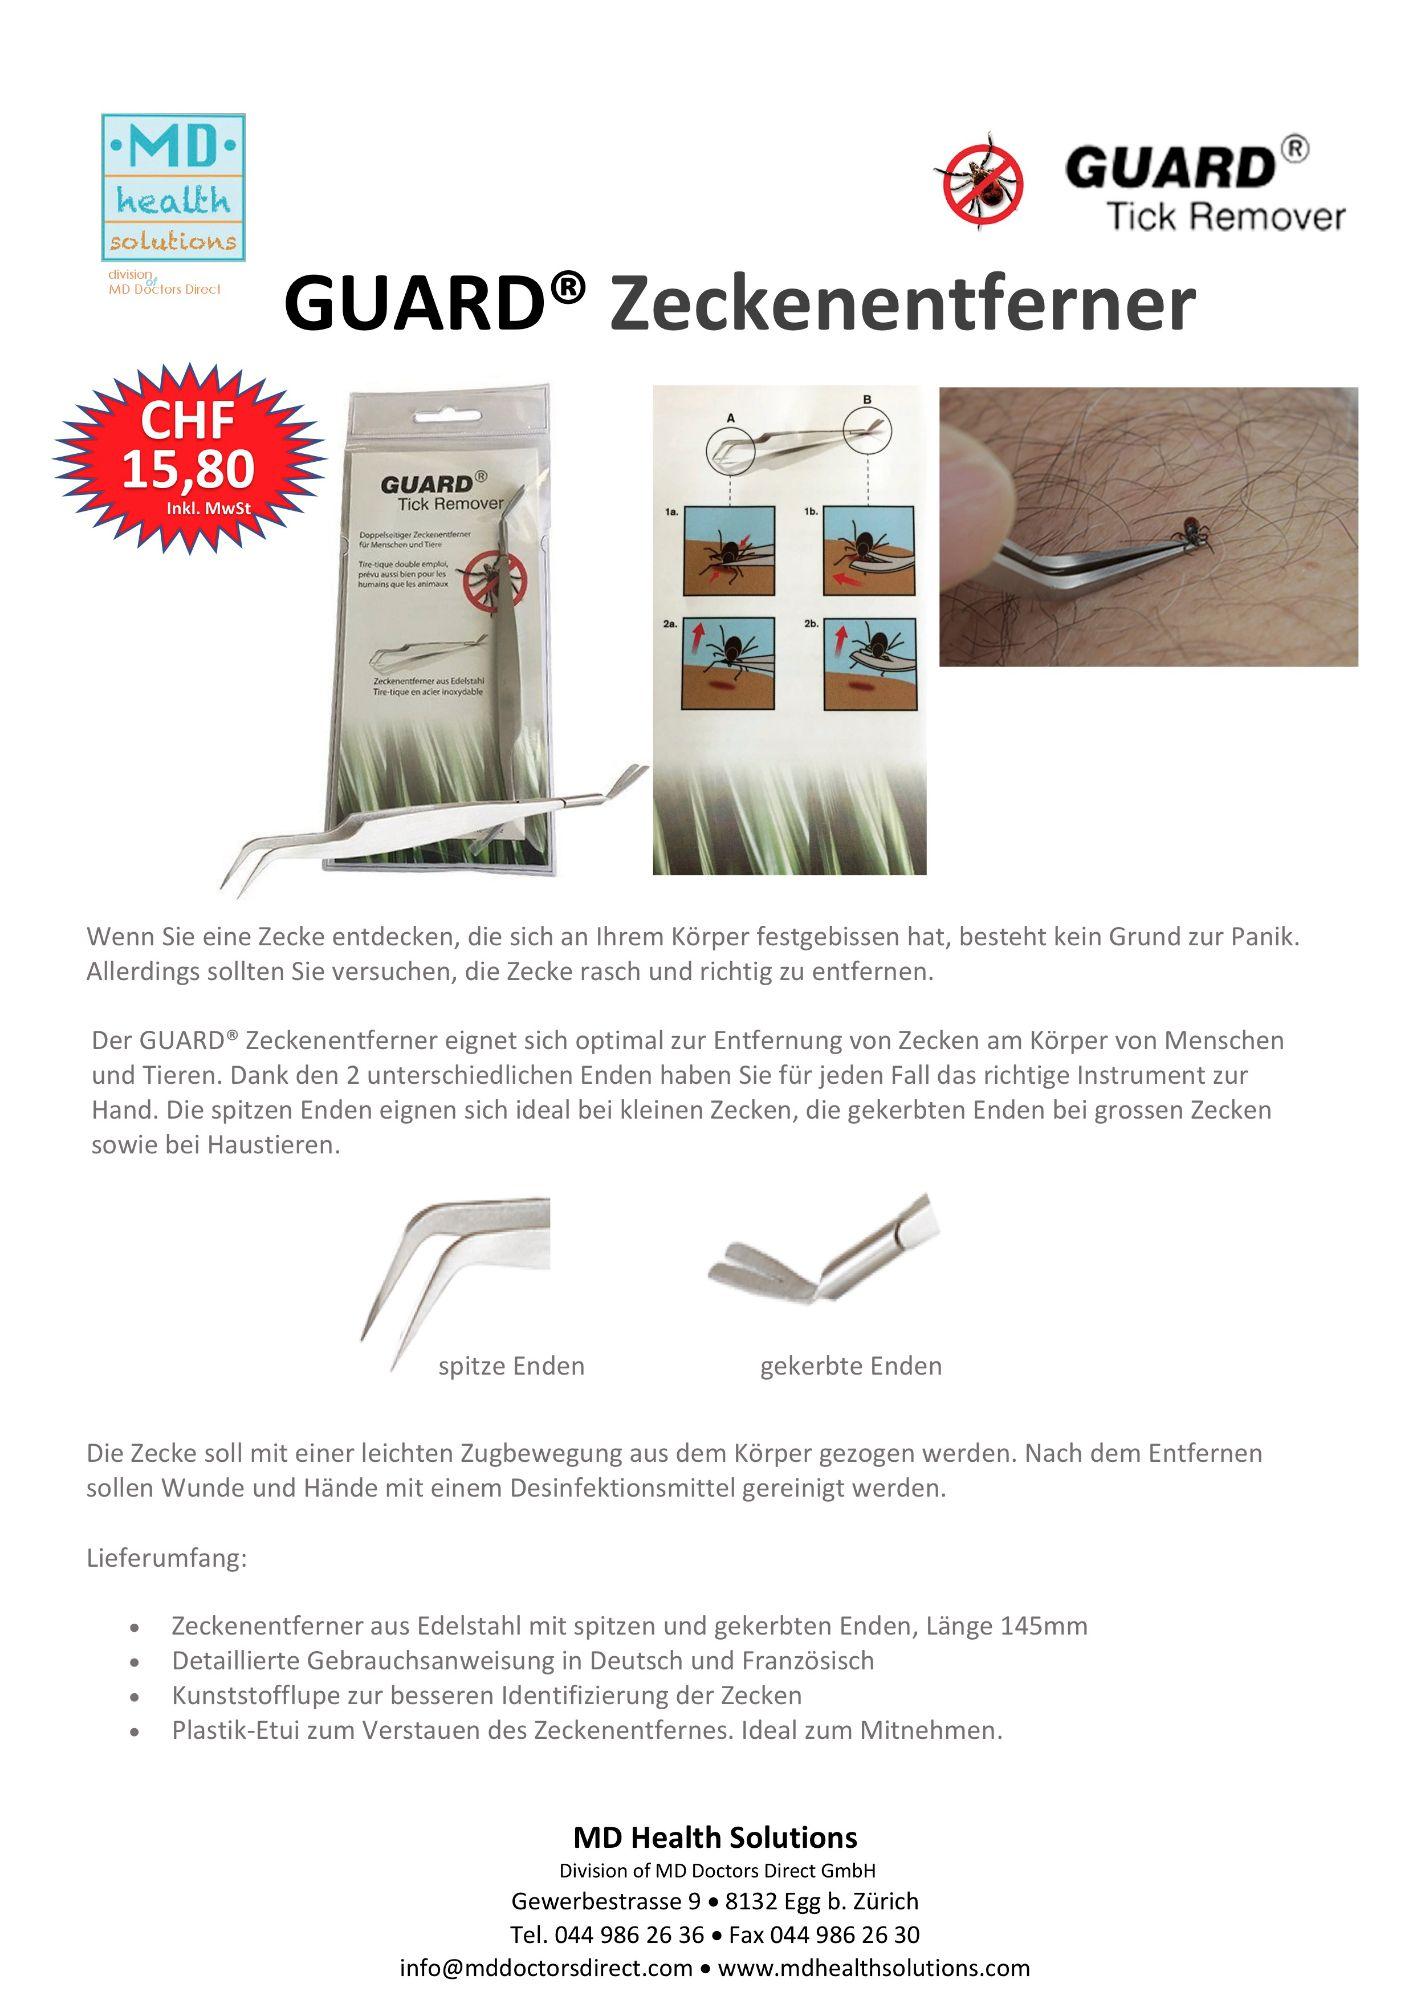 GUARD® Zeckenentferner Web